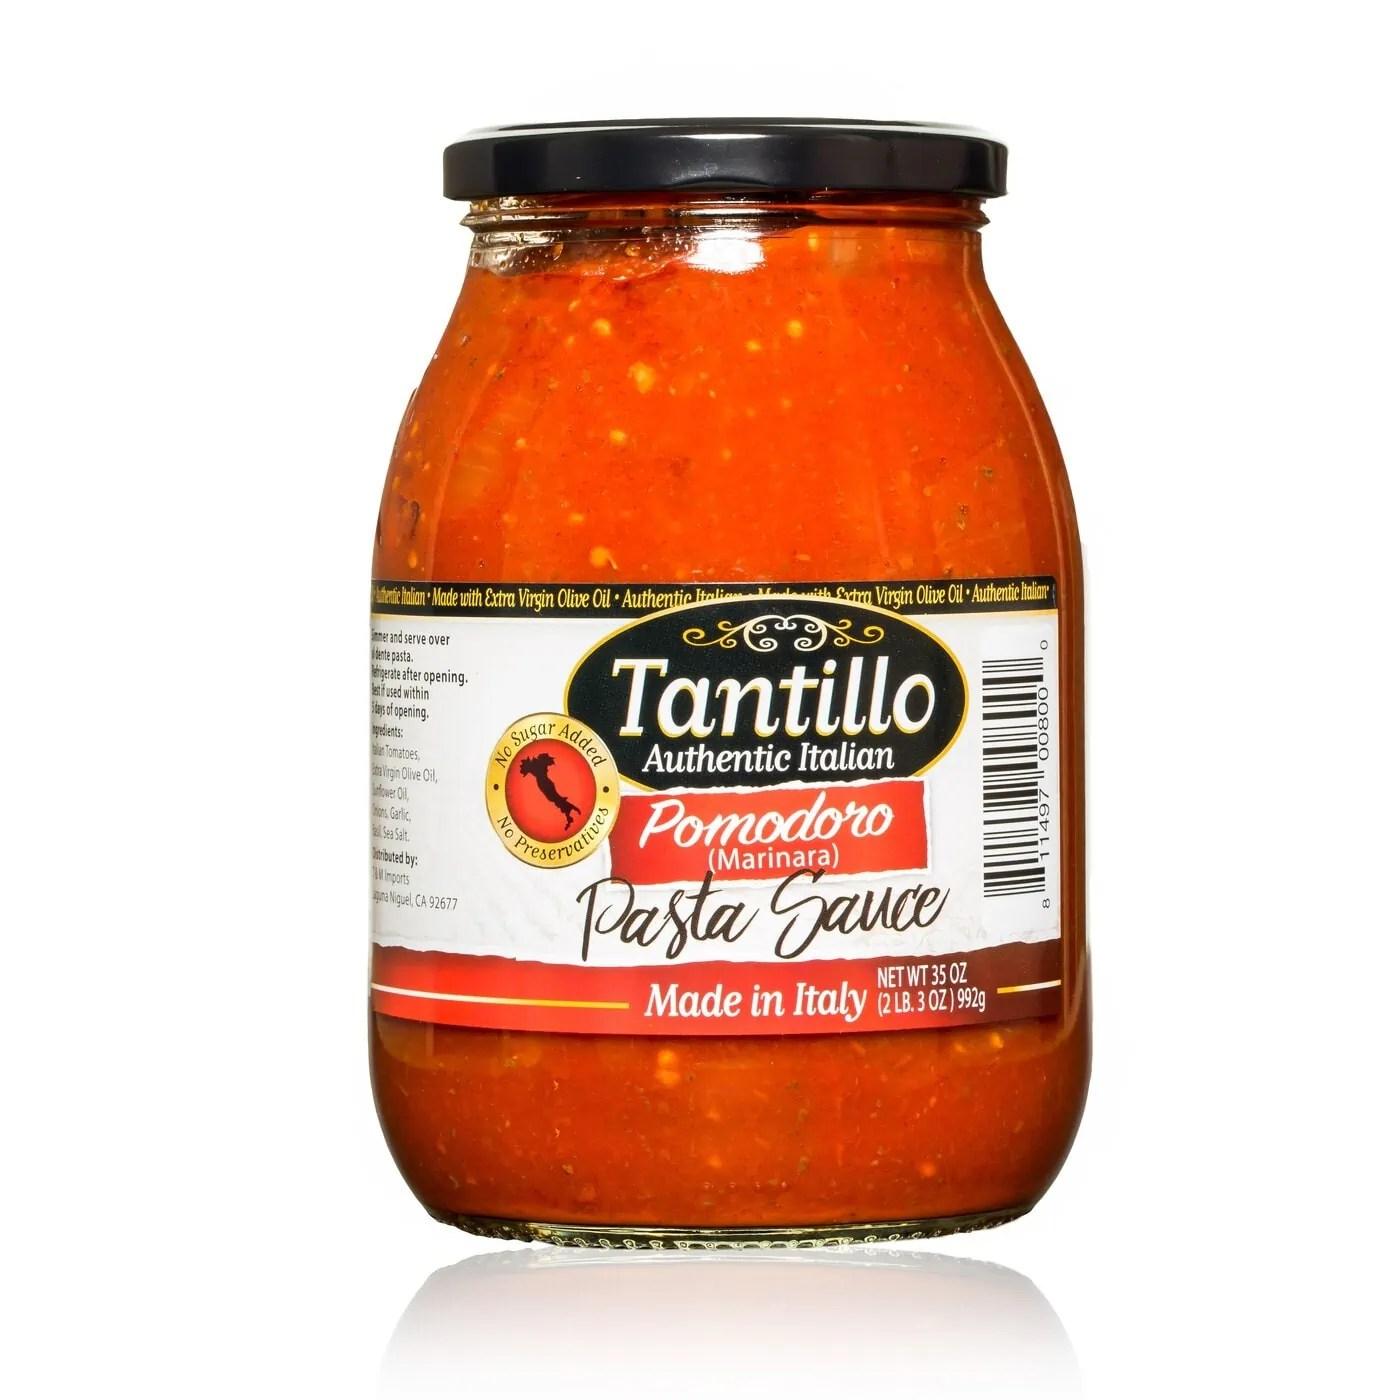 Tantillo Imported Italian Pomodoro Pasta Sauce